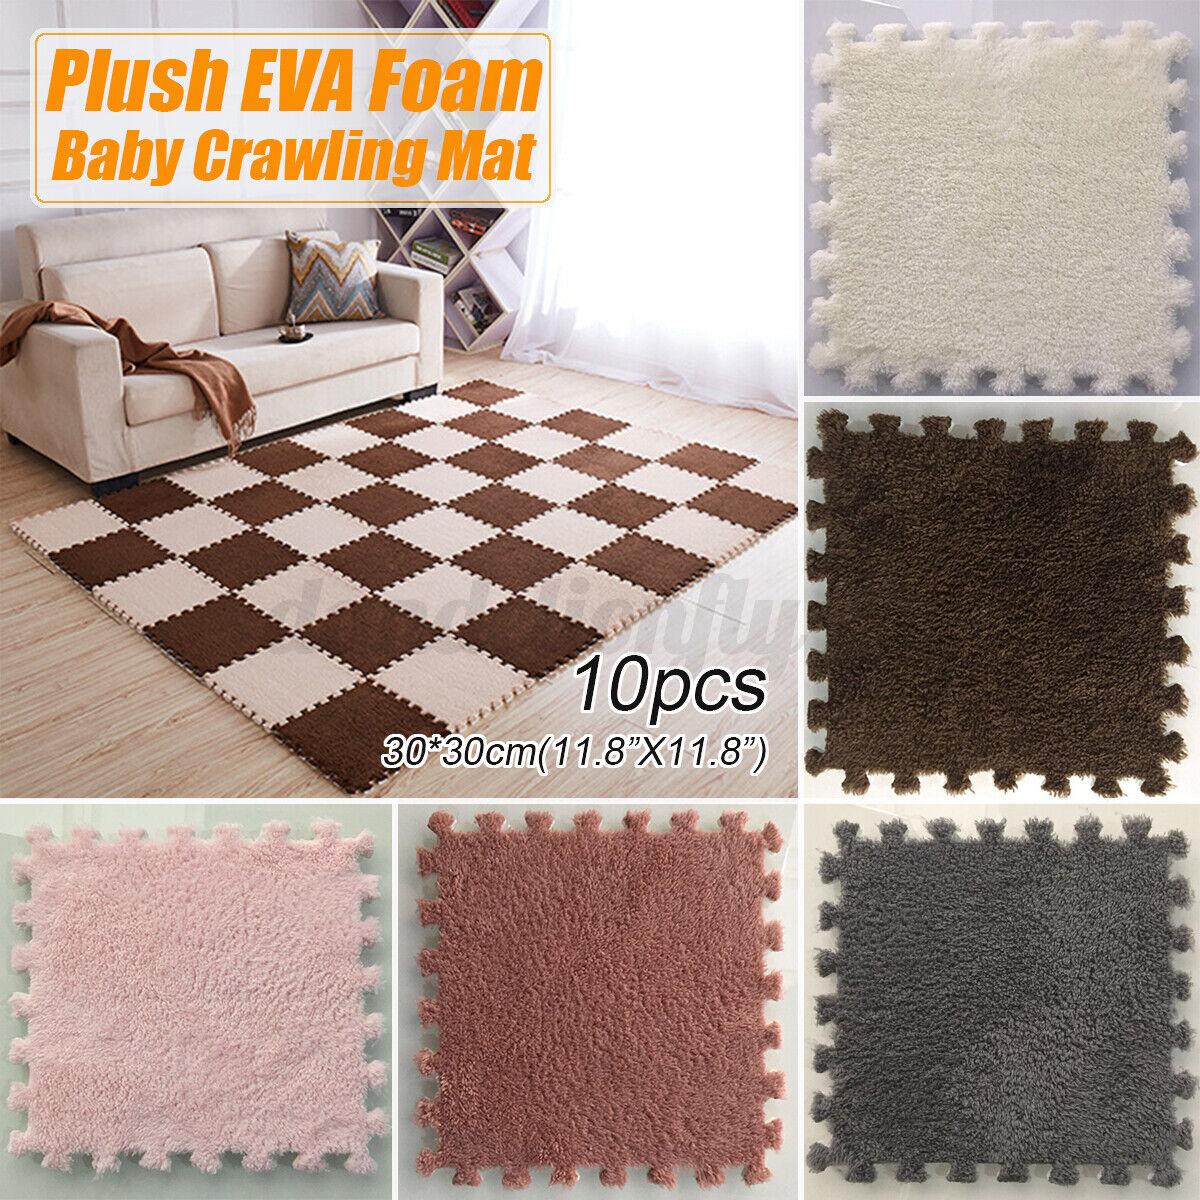 Large Thick Eva Foam Mat Soft Floor Tiles Interlocking Play Kids Baby Mats Gym